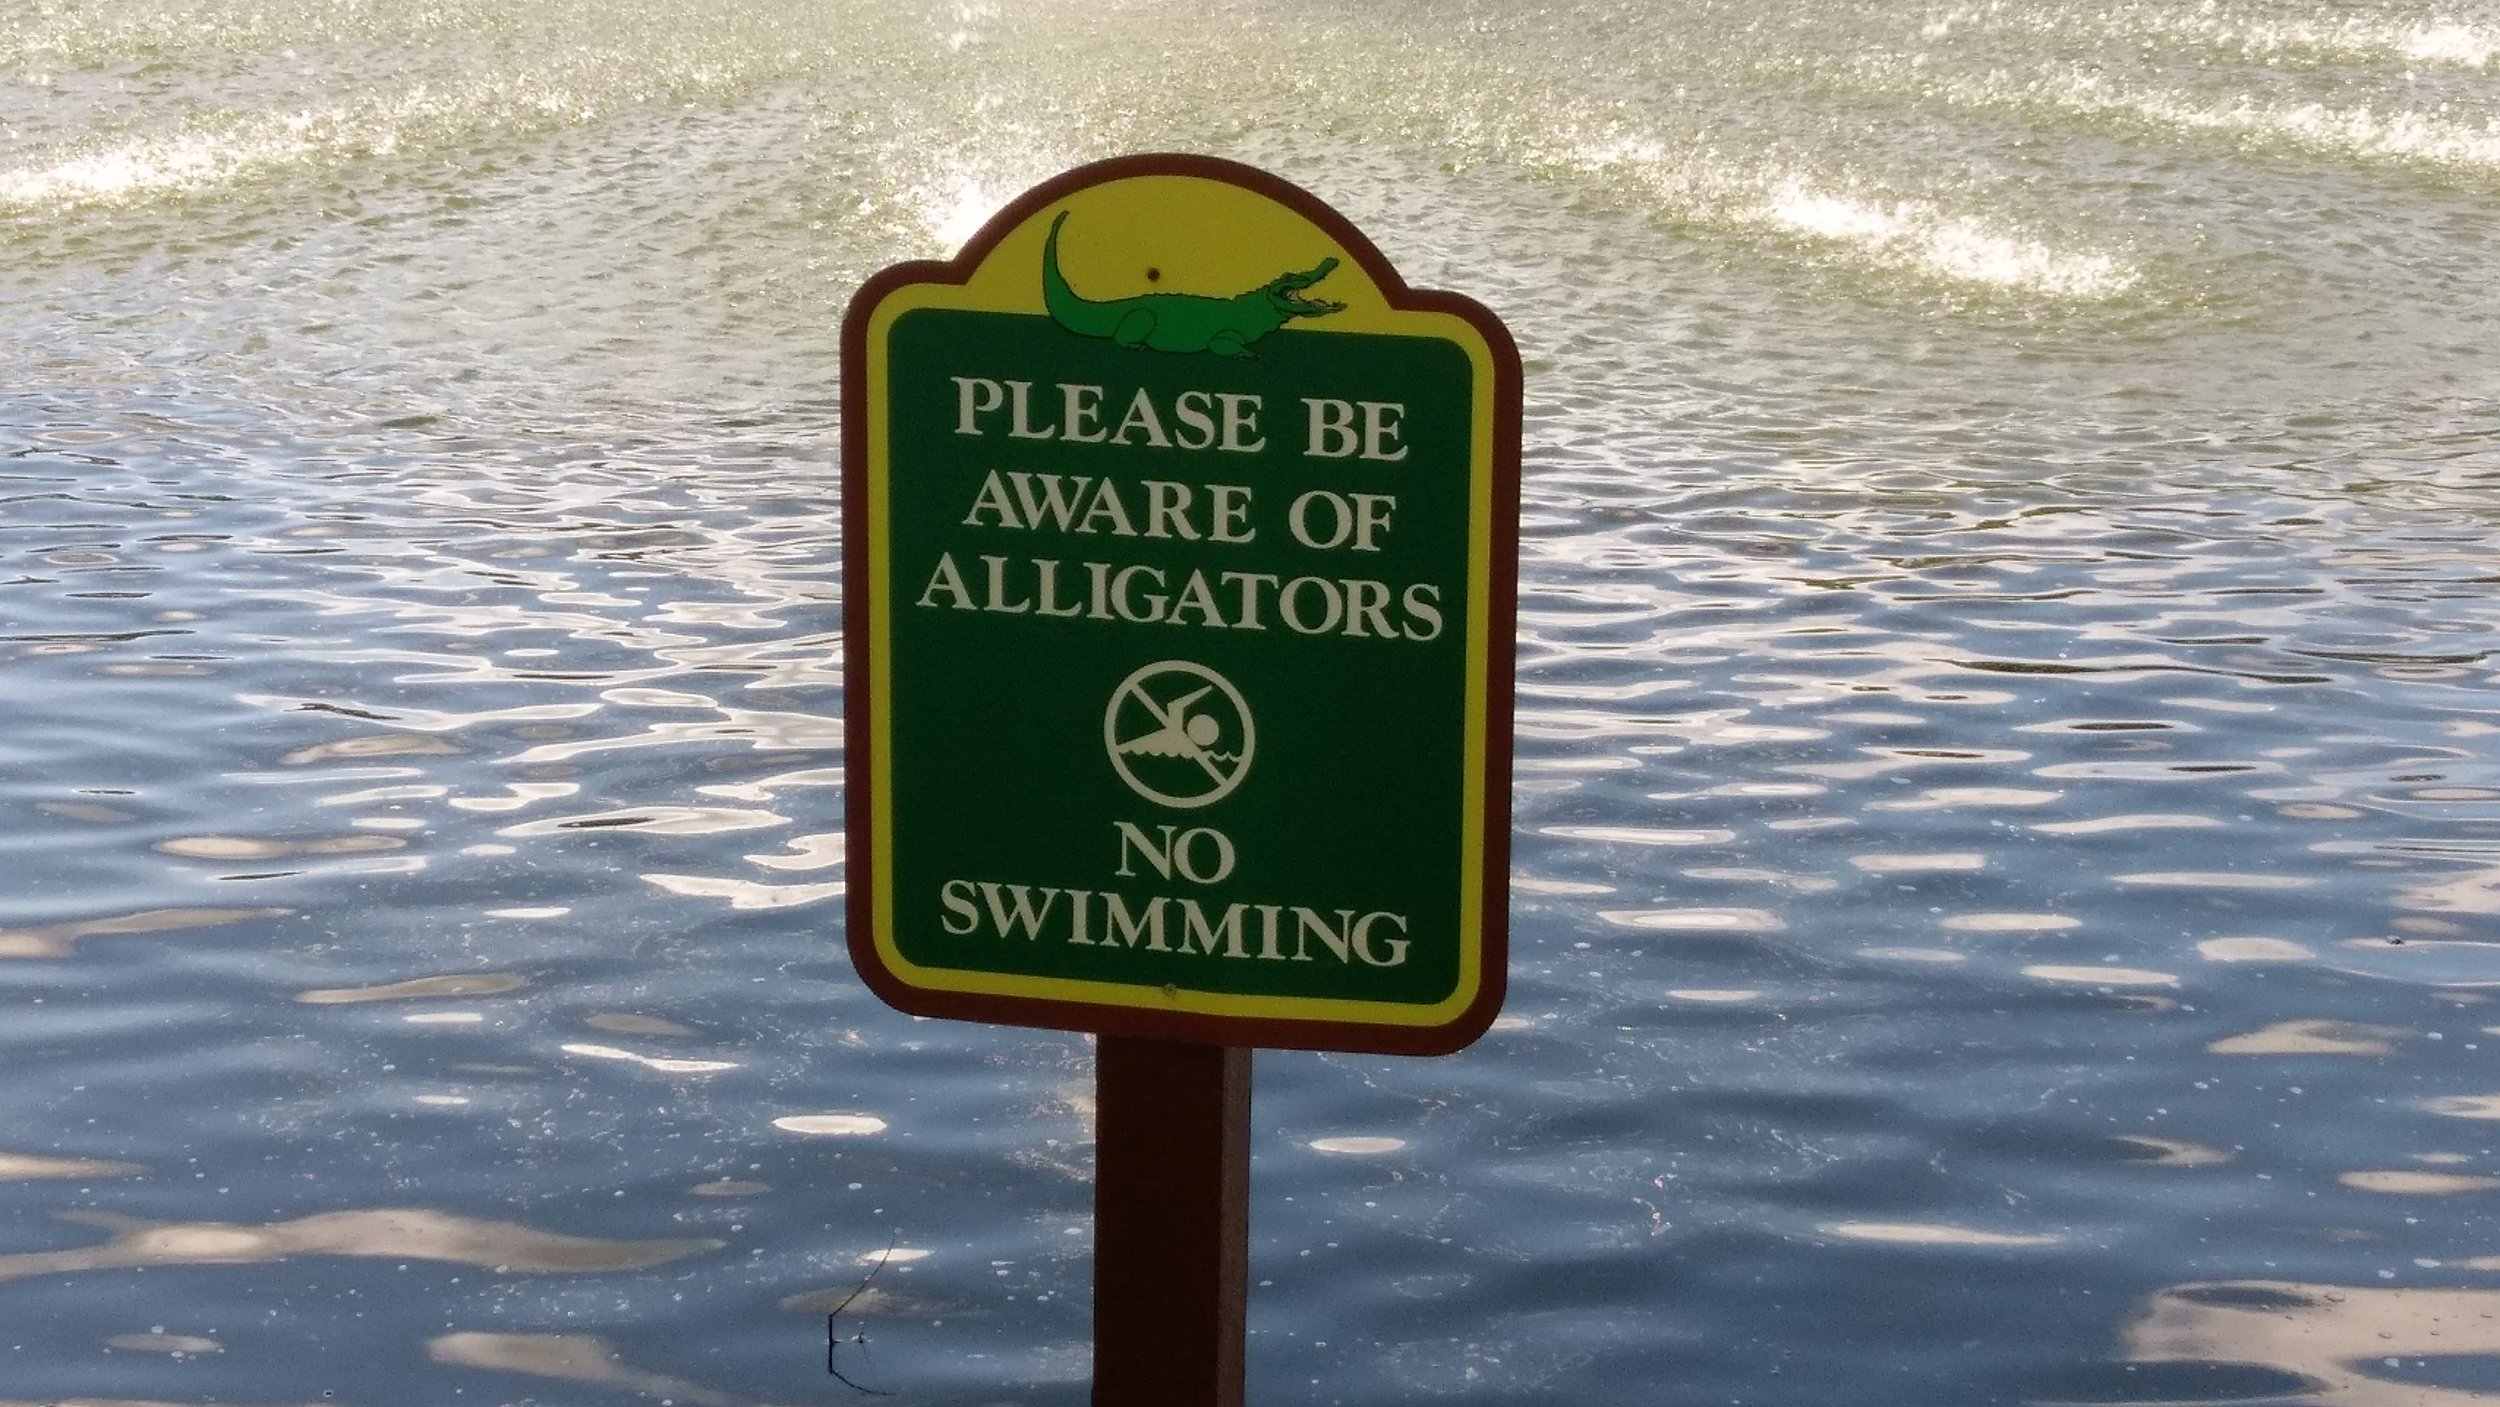 Don't go swimming